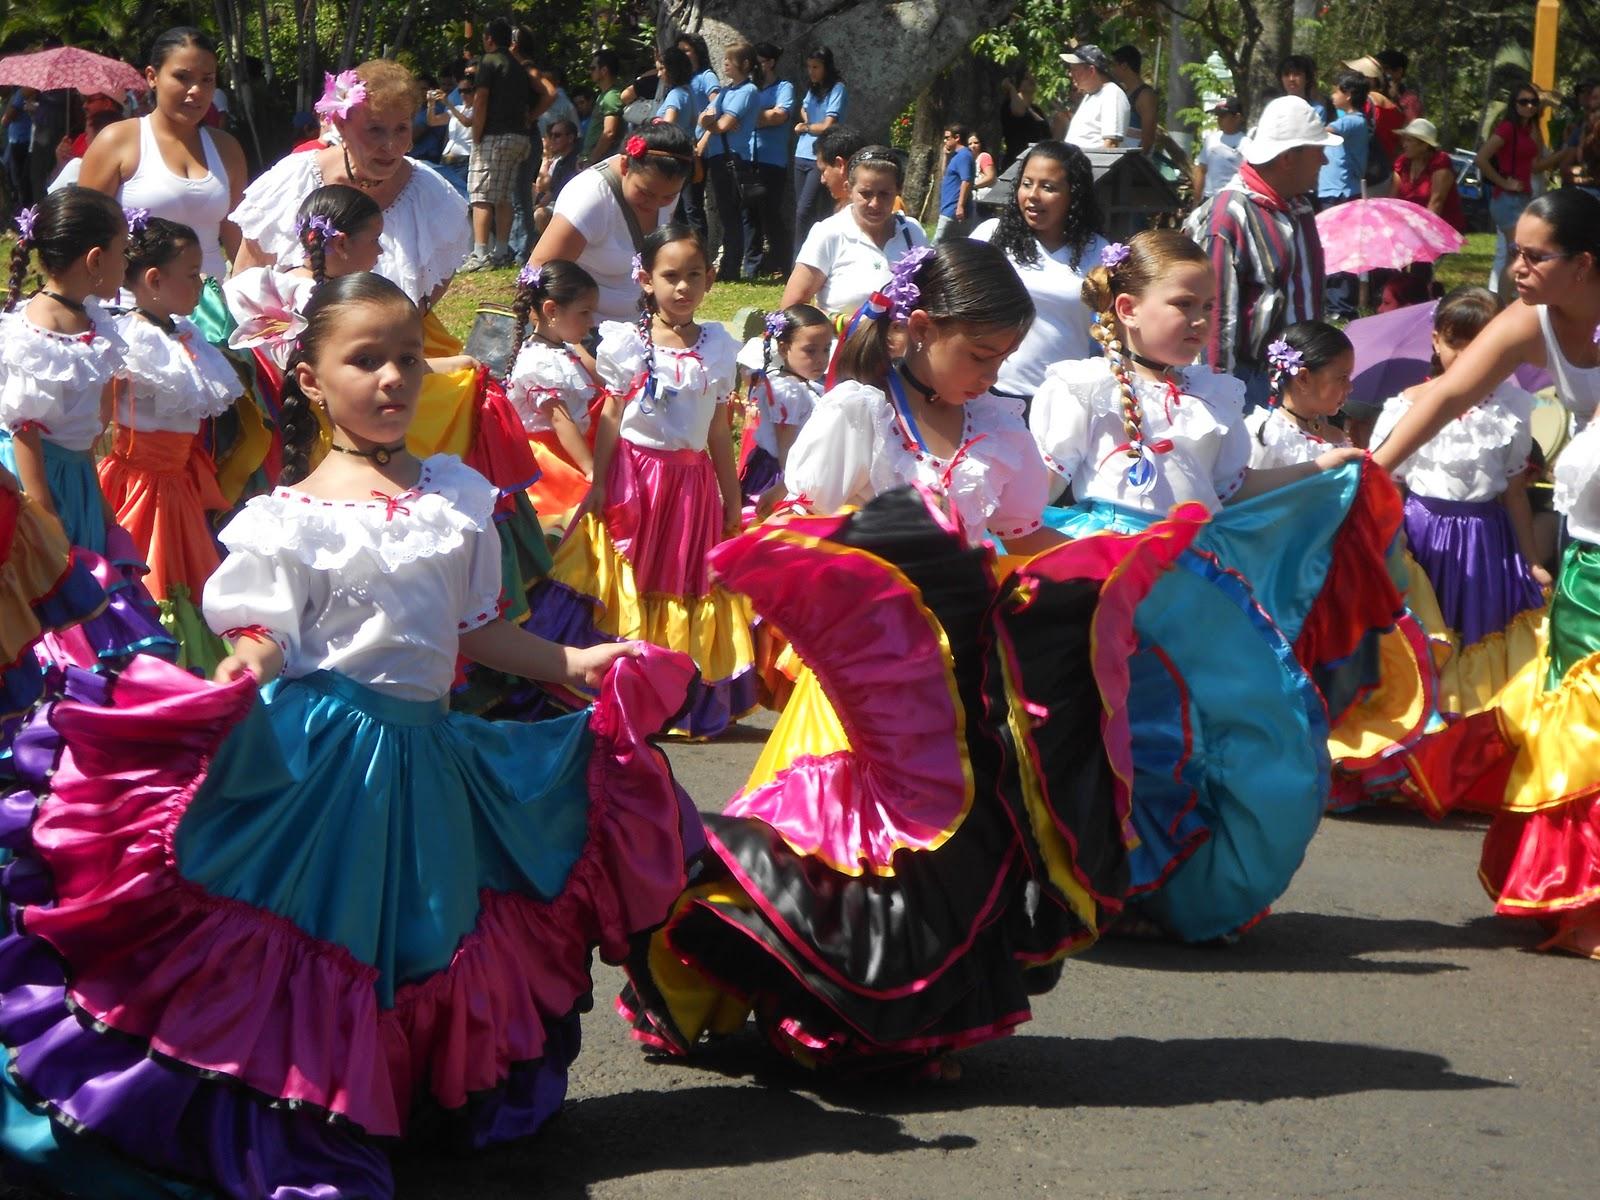 Celebrate Guanacaste Day Tico Style